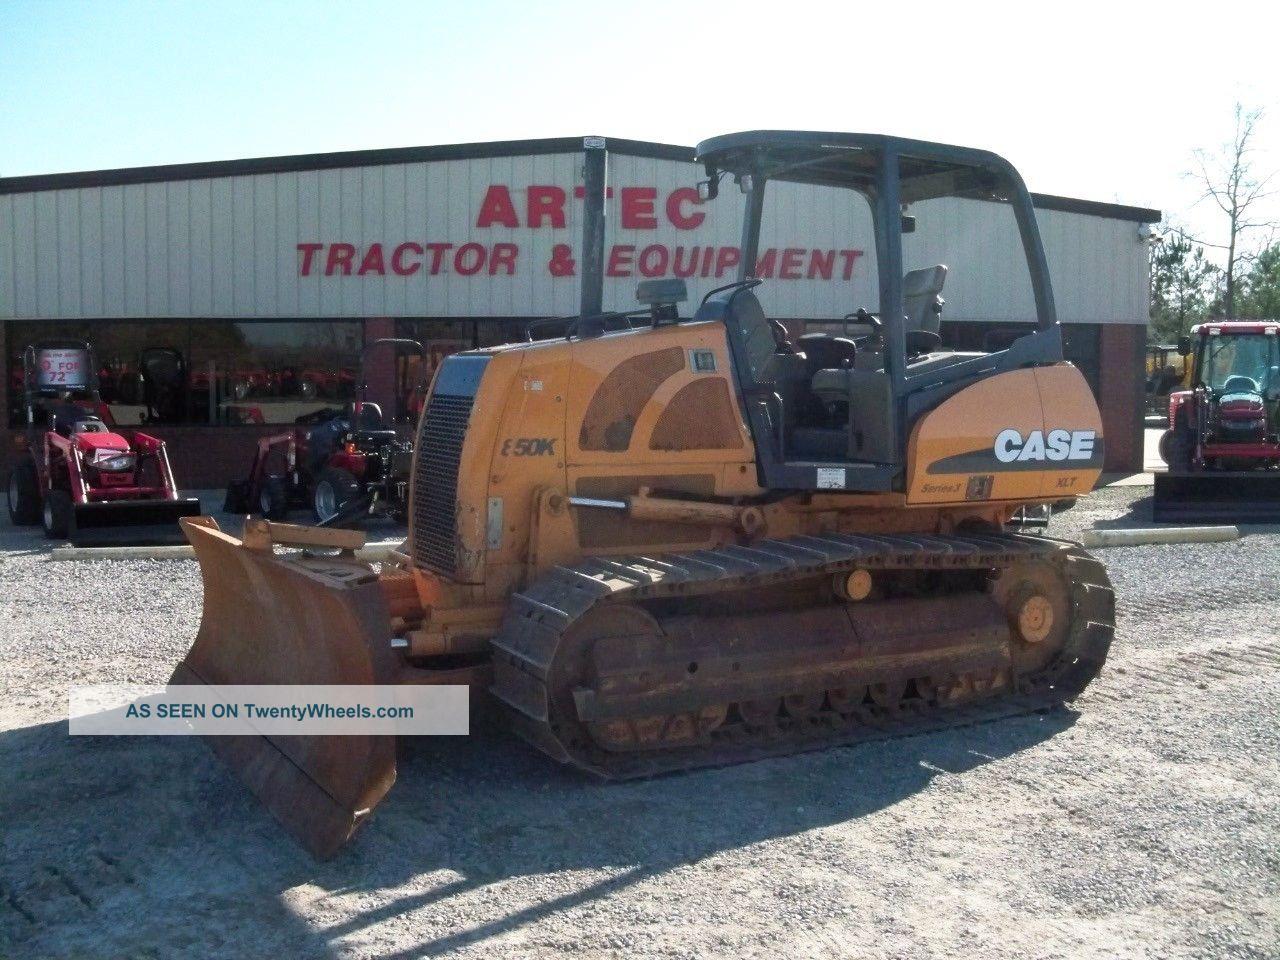 2007 Case 850k Xlt Bulldozer - Dozer - Crawler Tractor - Extra Long Track Crawler Dozers & Loaders photo